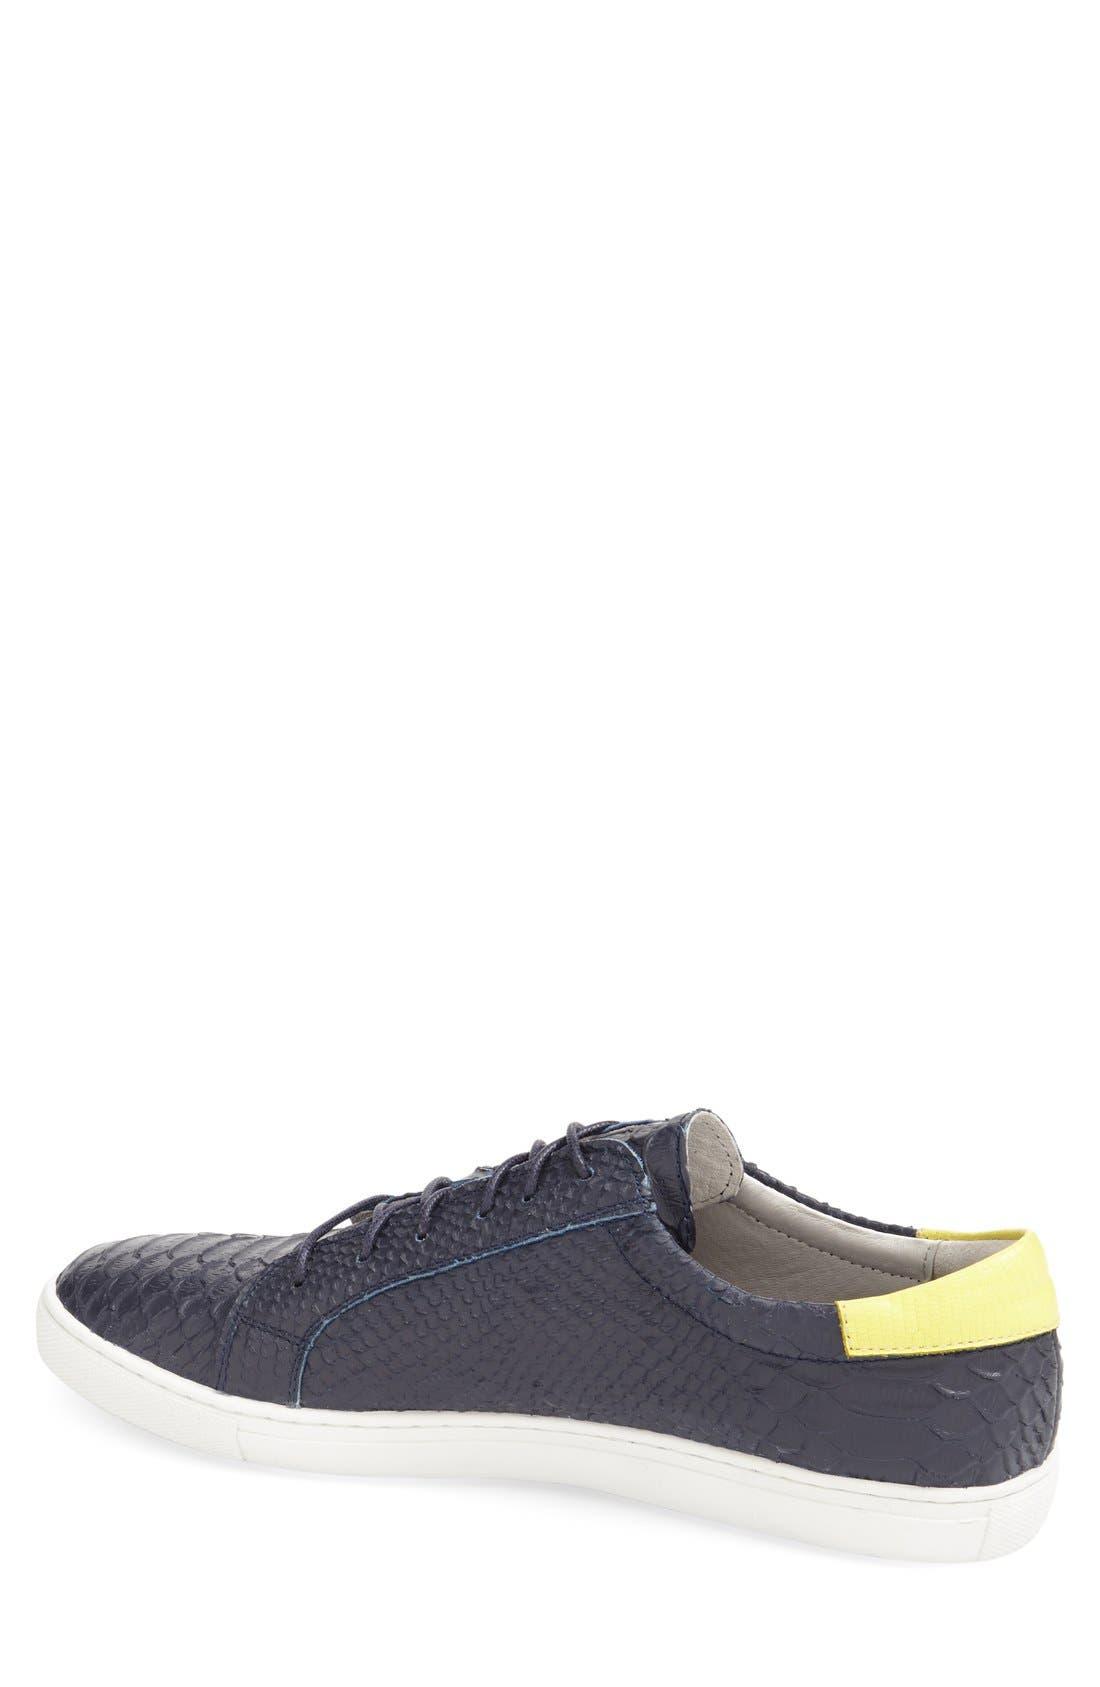 'Riff' Sneaker,                             Alternate thumbnail 4, color,                             Navy Leather